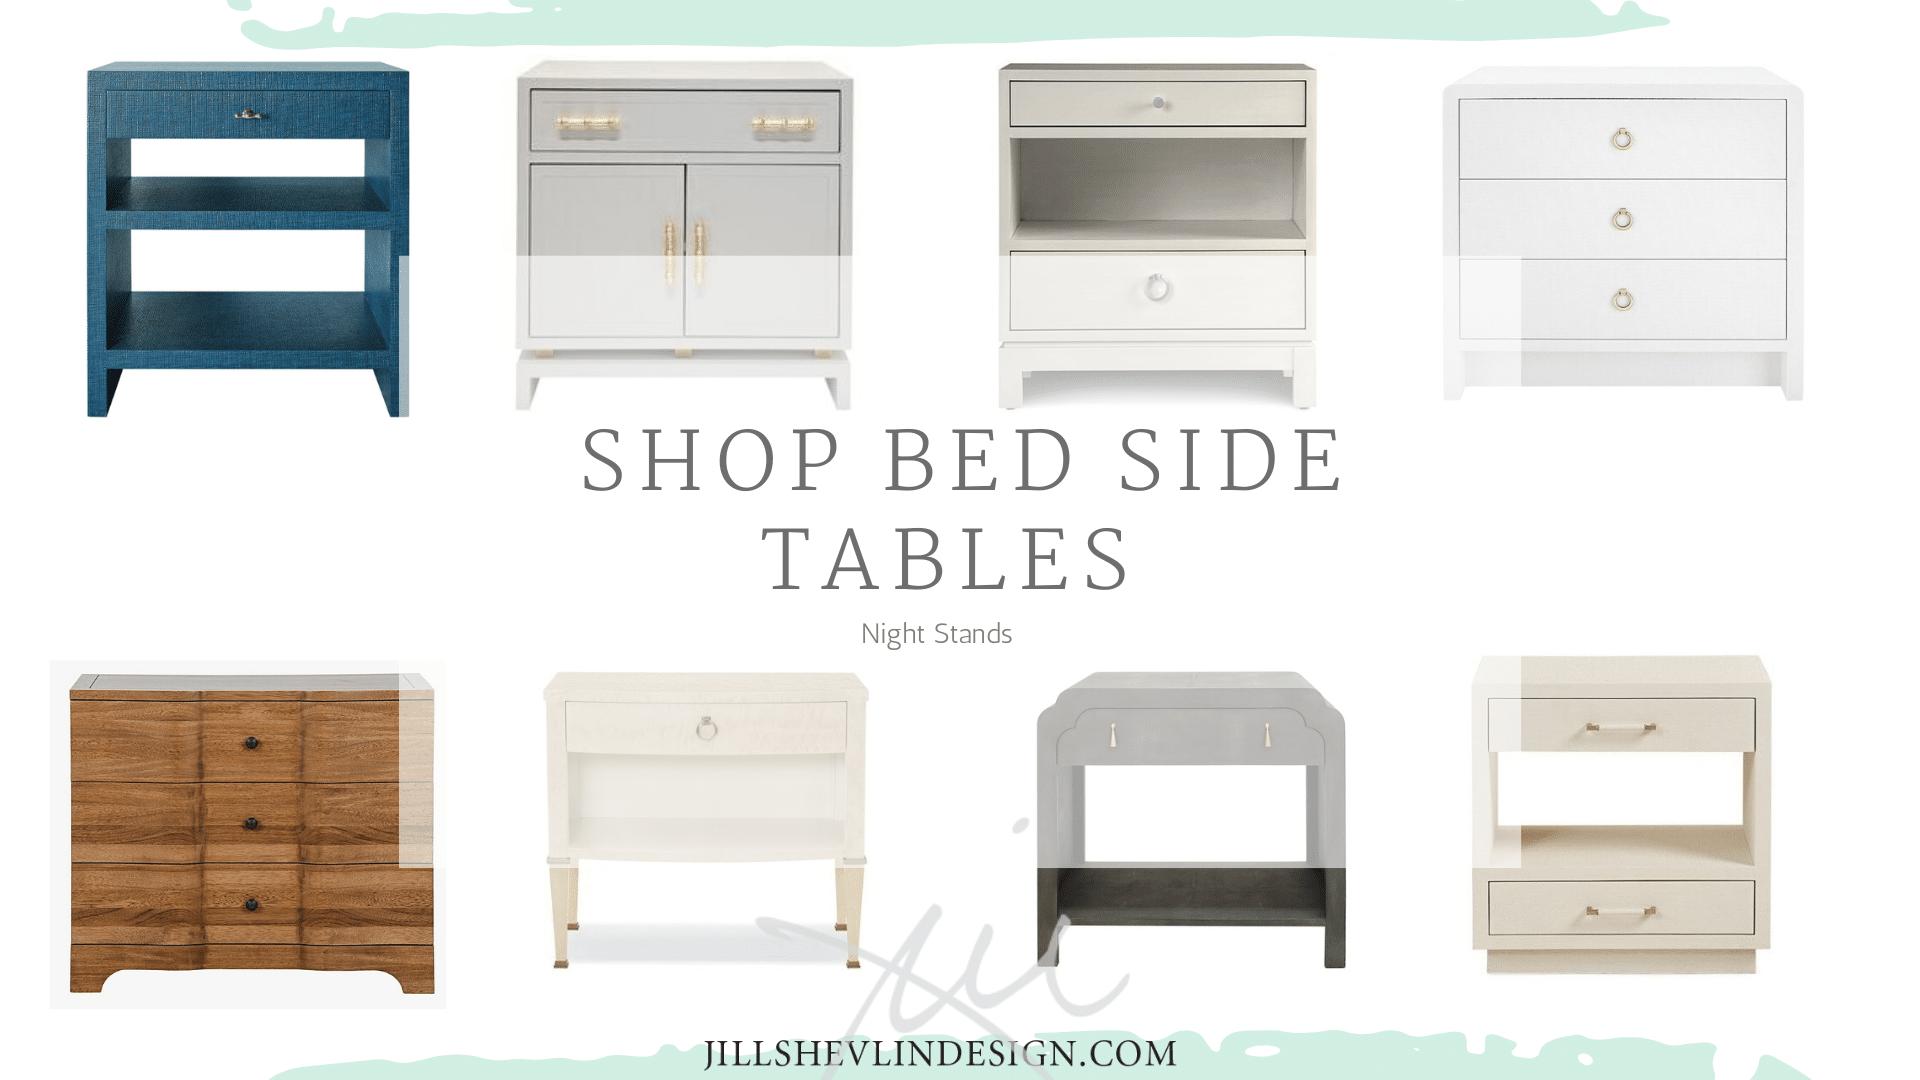 Bed Side Tables, Night Stands, Luxury Bedroom Furnitre Coastal Modern Farmhouse Fresh JillShevlin Design